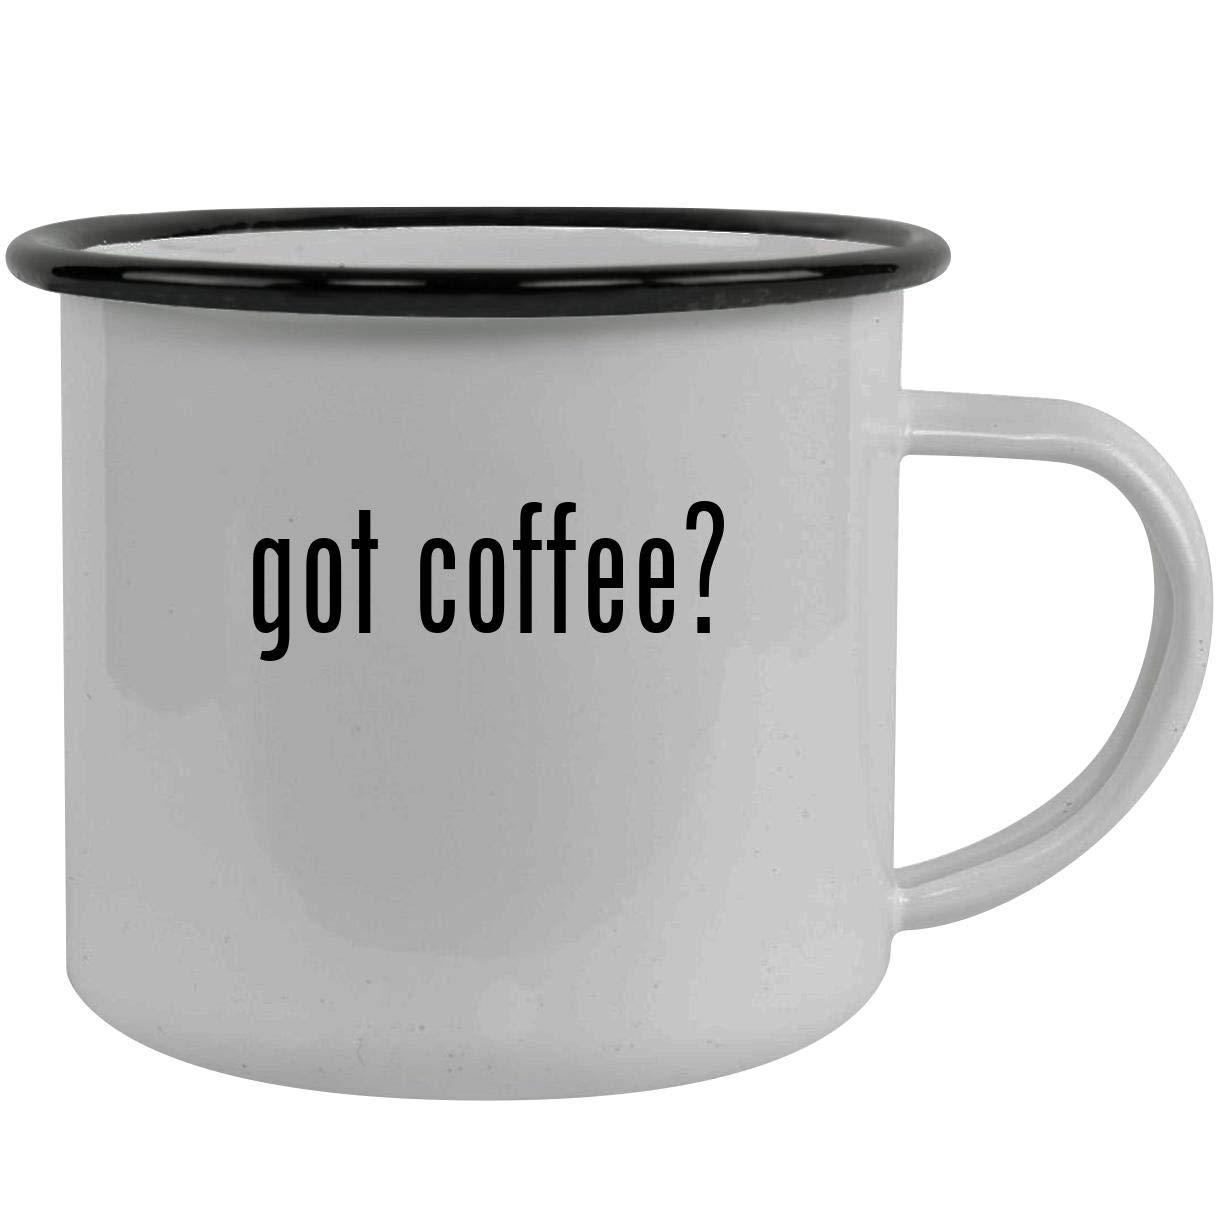 got coffee? - Stainless Steel 12oz Camping Mug, Black